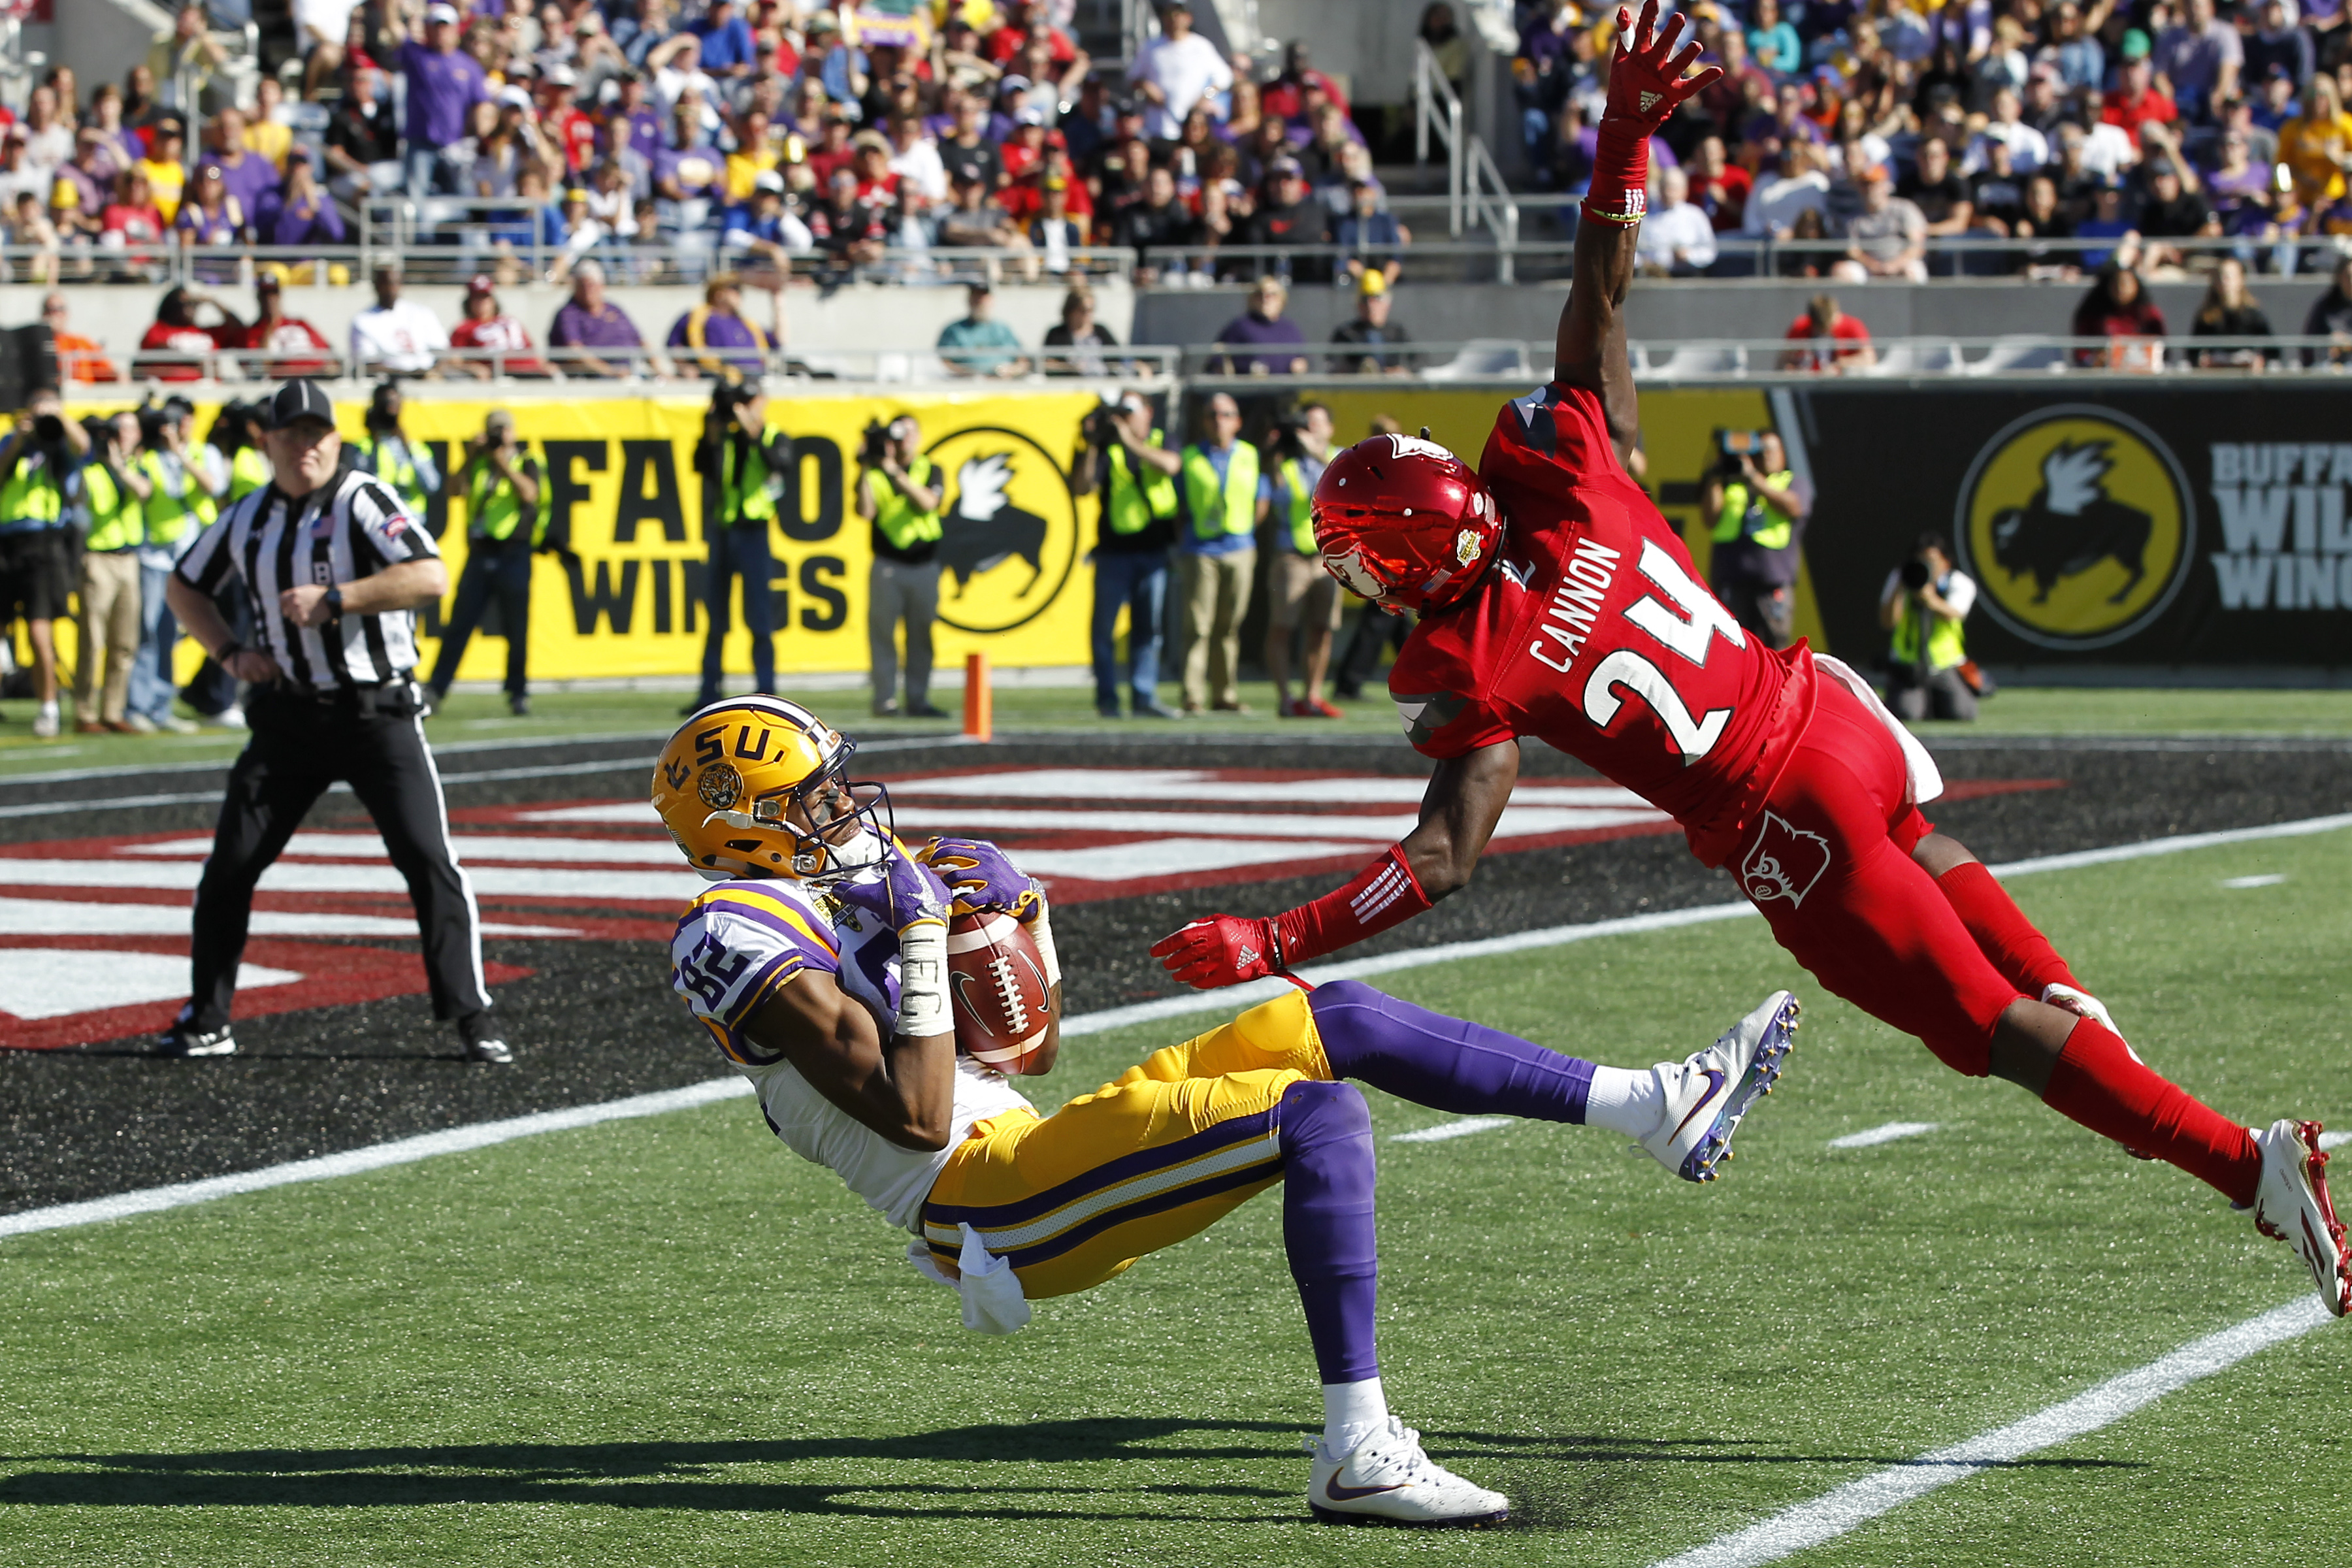 NCAA FOOTBALL: DEC 31 Citrus Bowl - LSU v Louisville